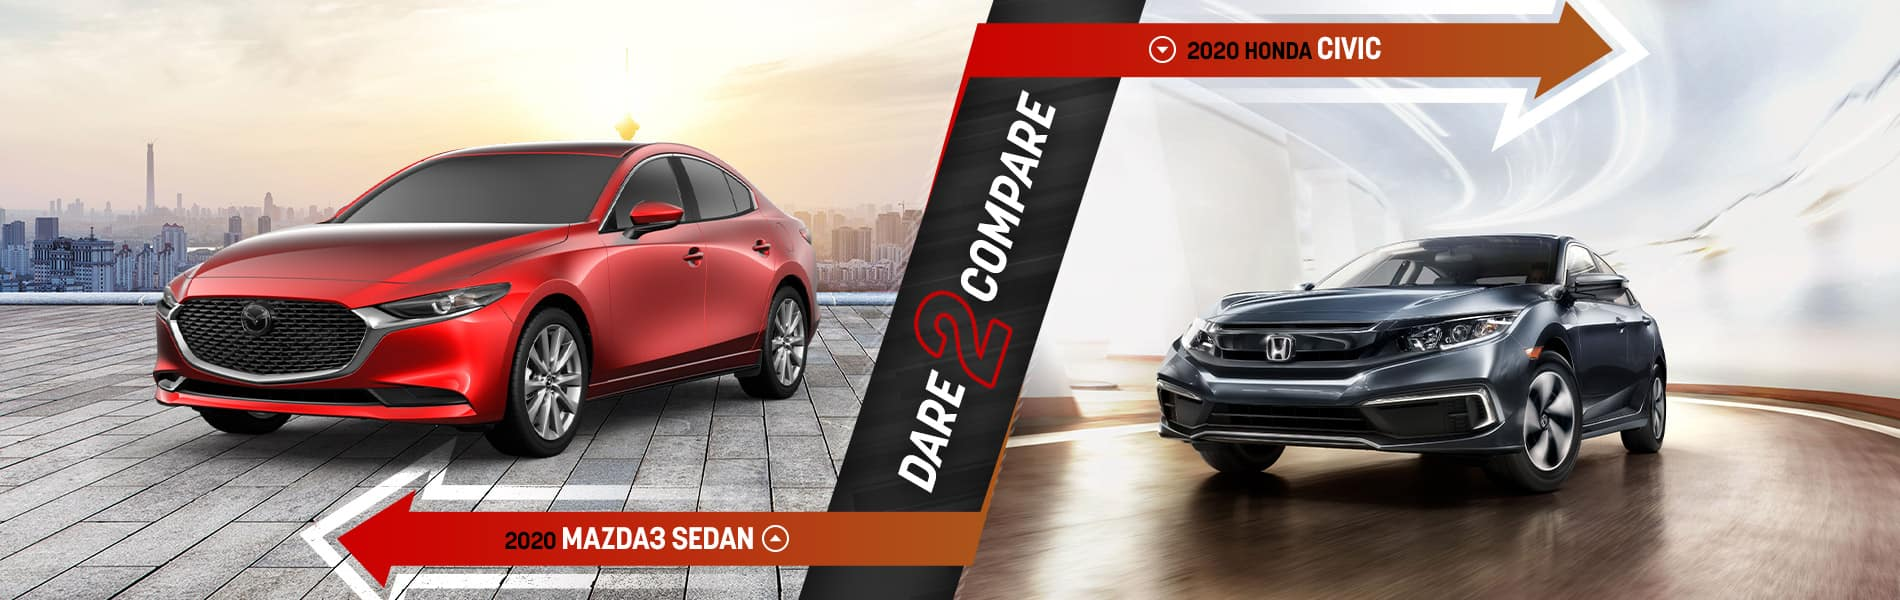 2020 Mazda3 vs. the Competition - Mazda of Bedford - Bedford, OH